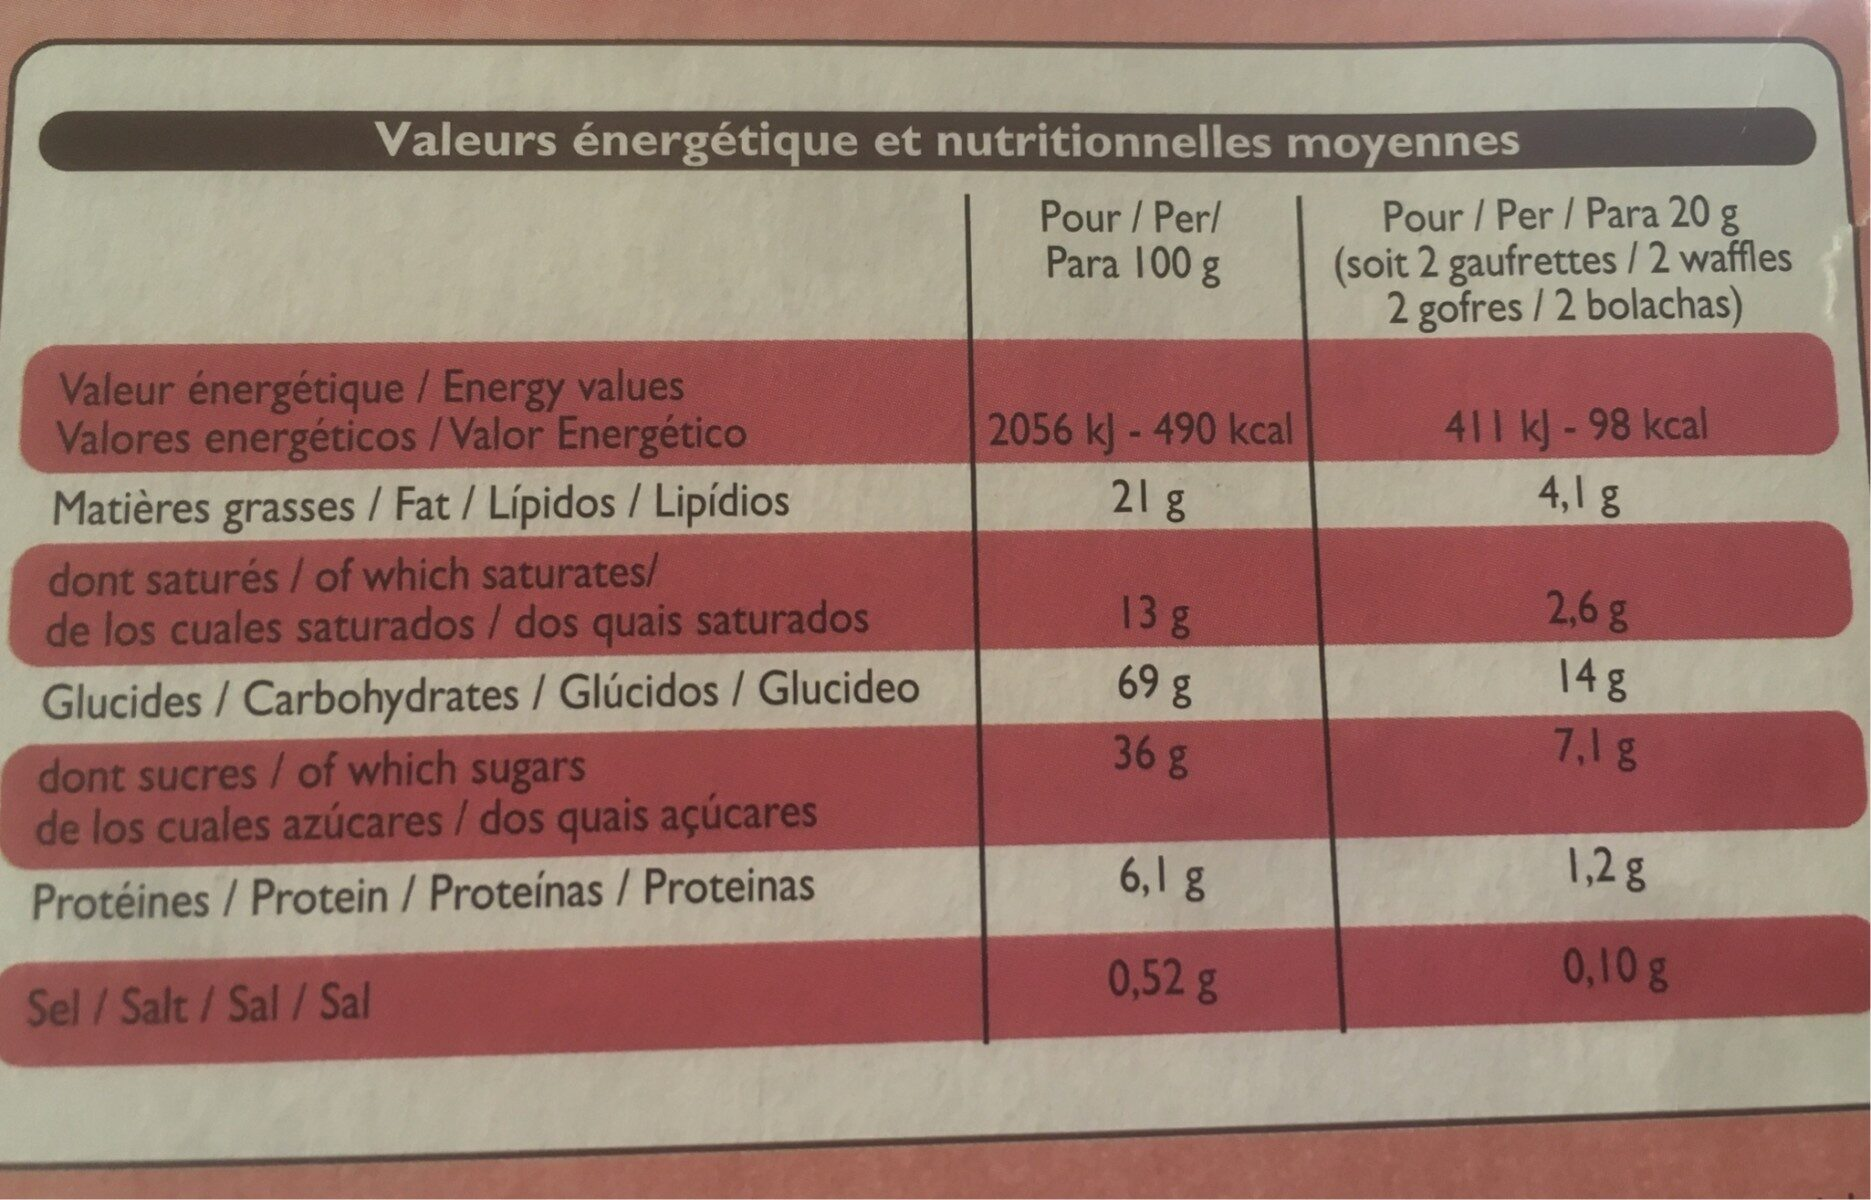 Gaufrettes fines pur beurre - Ingrediënten